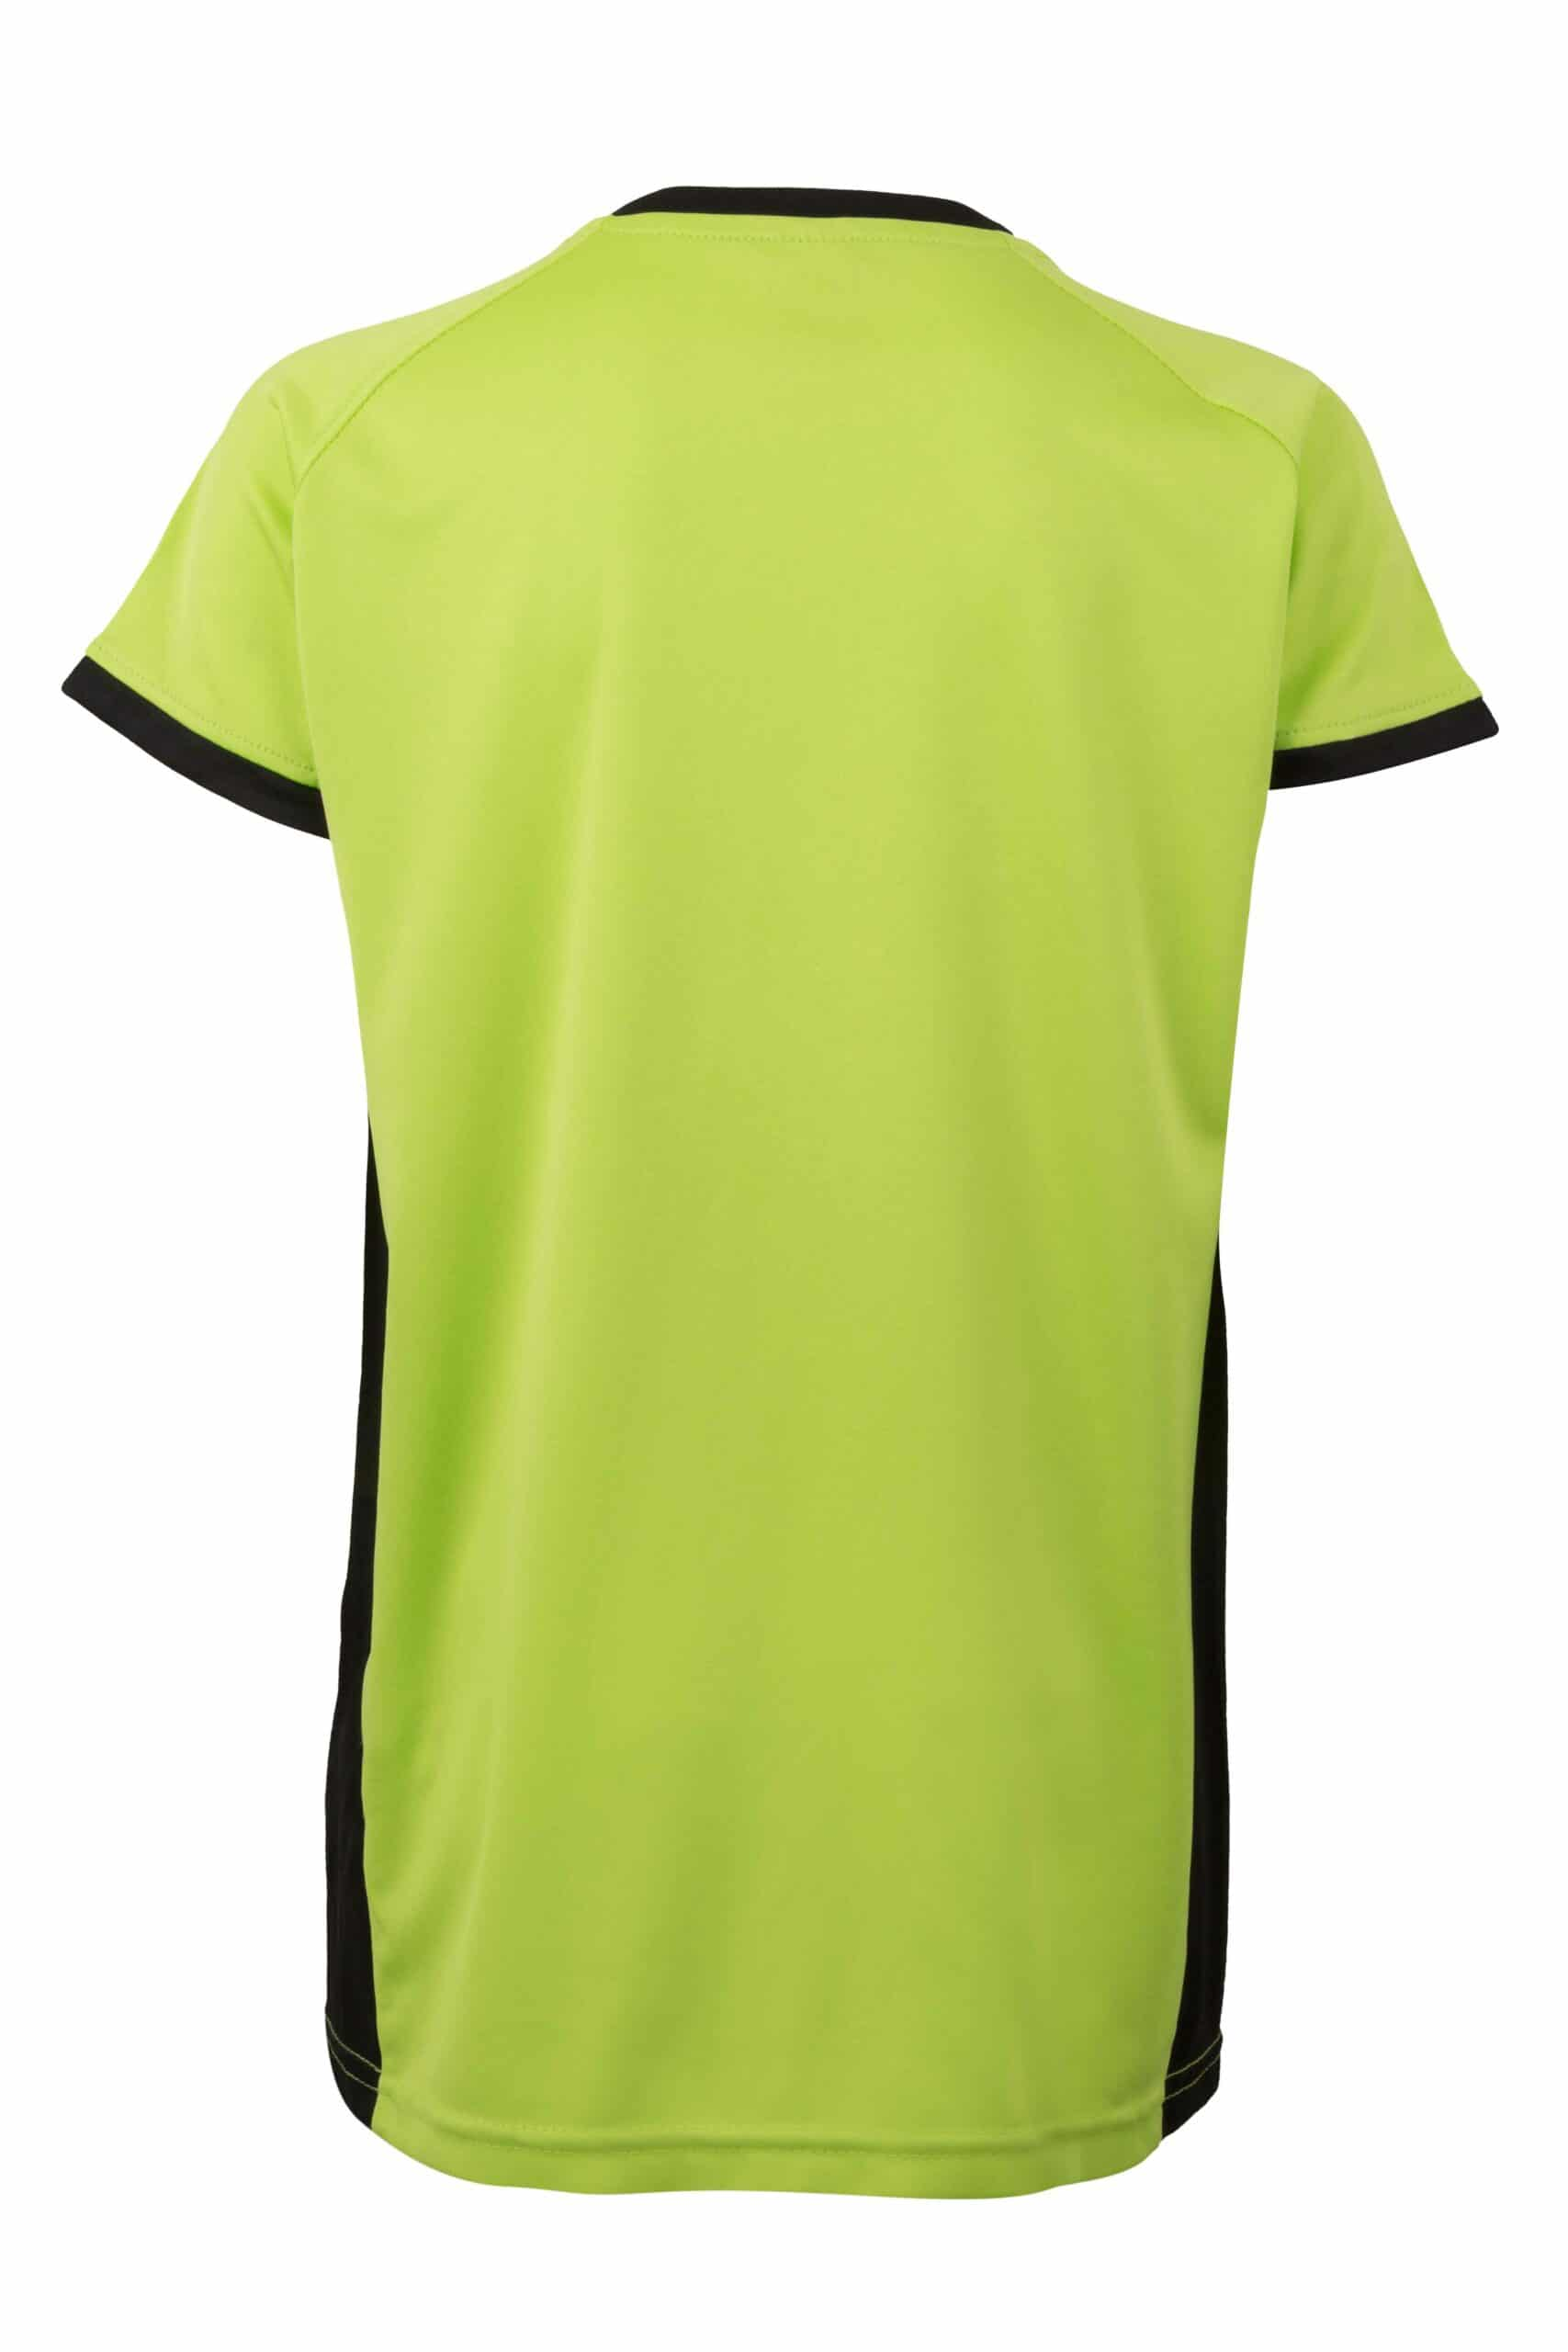 Mukua Mk531v Camiseta TÉcnica Manga Corta Bicolor NiÑo Lime Black 2